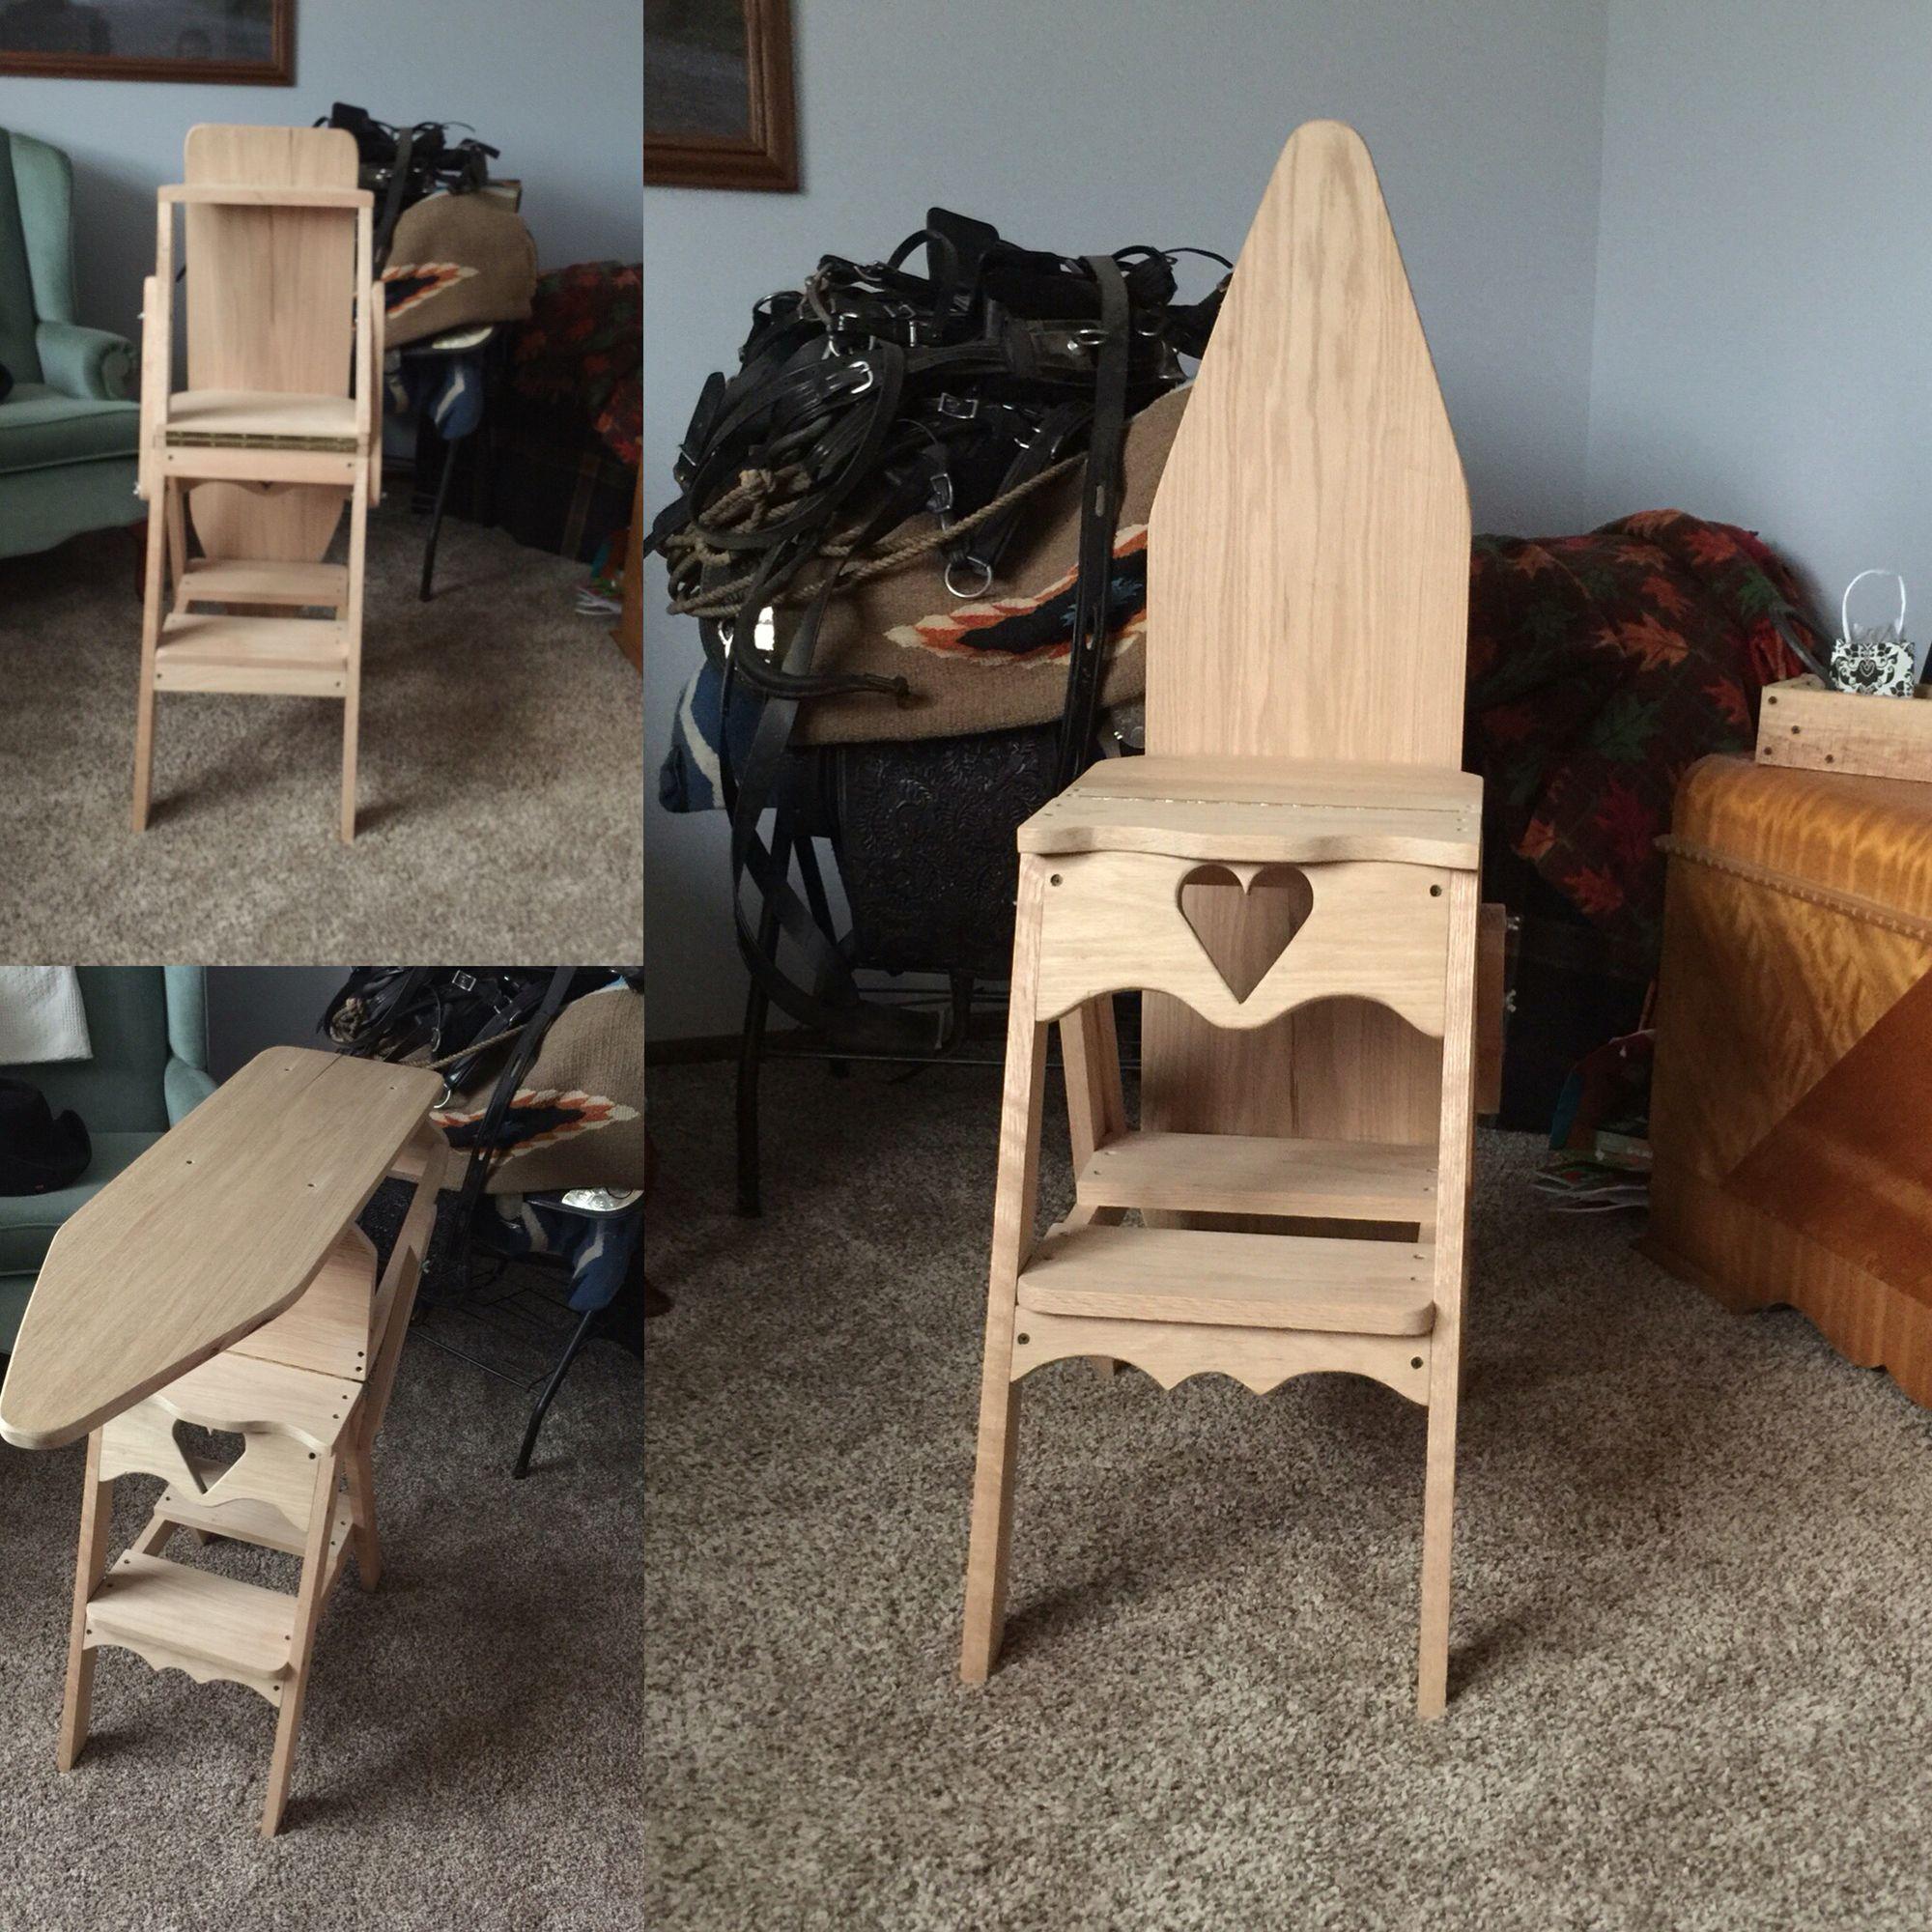 Fantastic 3In1 Ironing Board Step Stool Chair All Oak Built By John Uwap Interior Chair Design Uwaporg